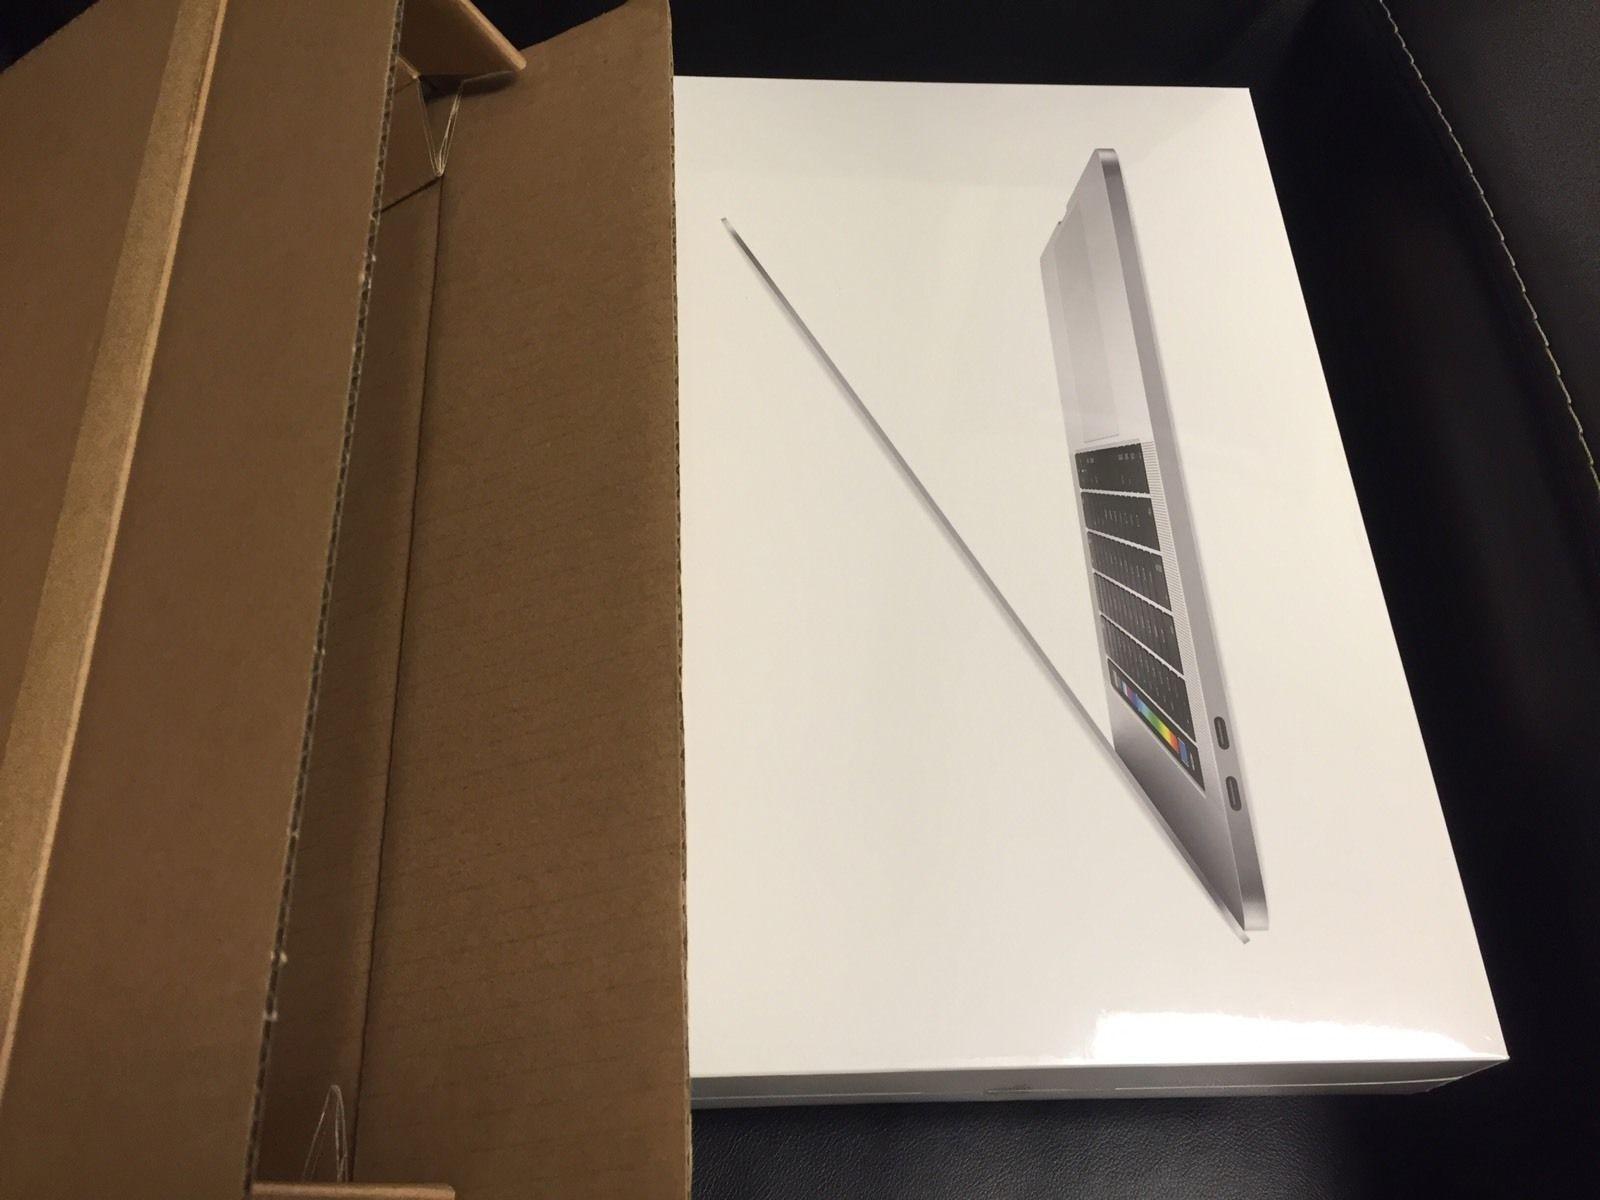 Apple MacBook PRO i7 2 6GHz 16GB 256GB -Touch Bar- - İkinci